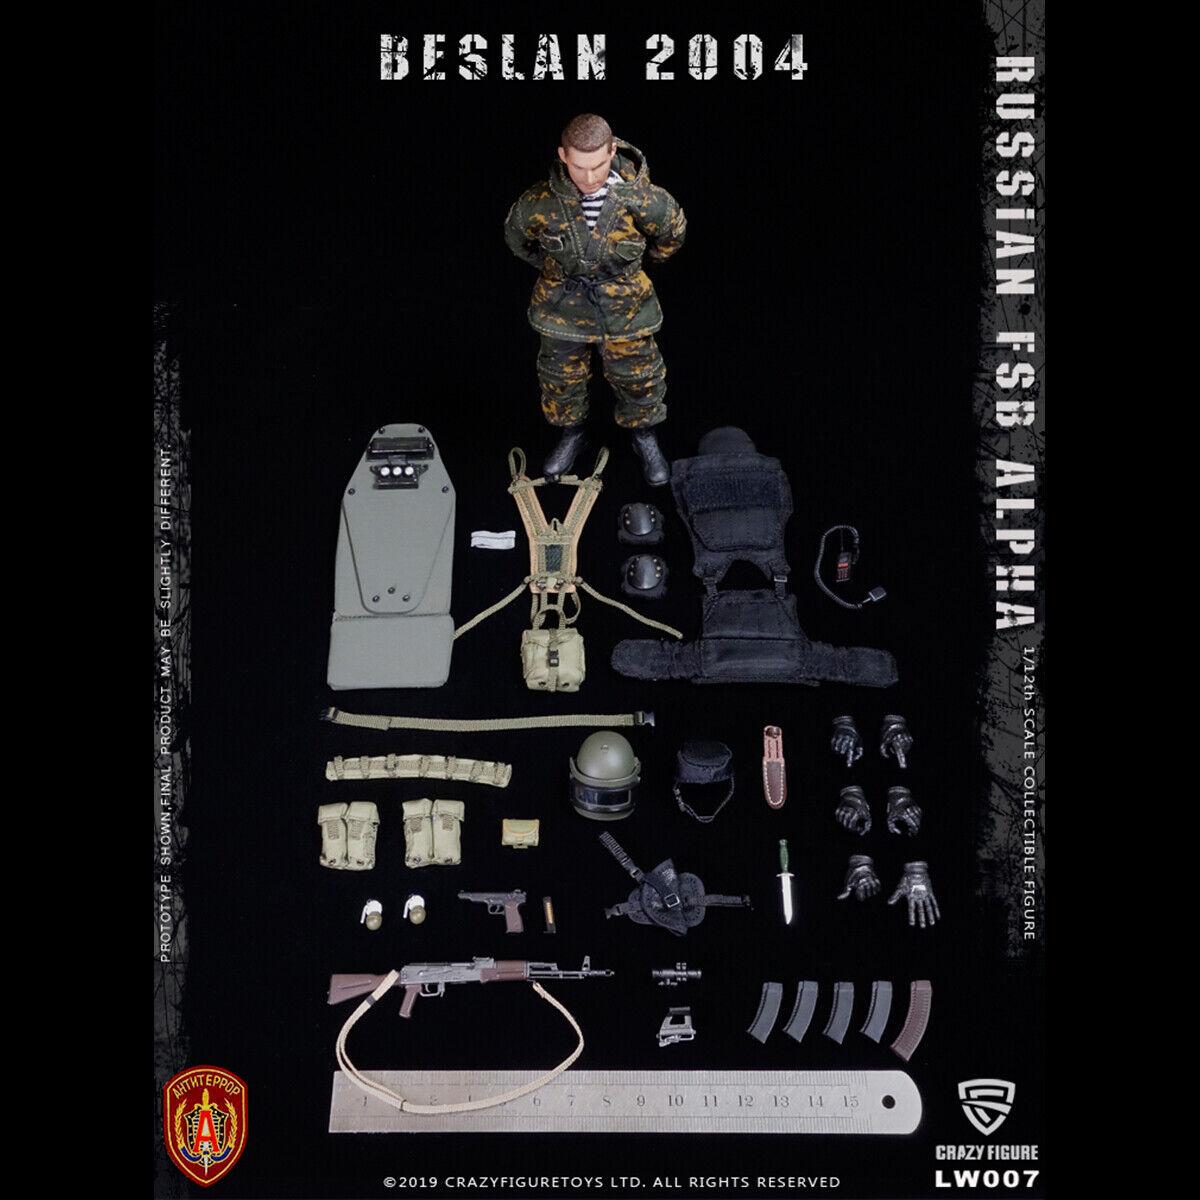 Crazy cifra LW007 112 delle Forze specialeei Russe ALFA pesante SCUDO cifra a uomoo